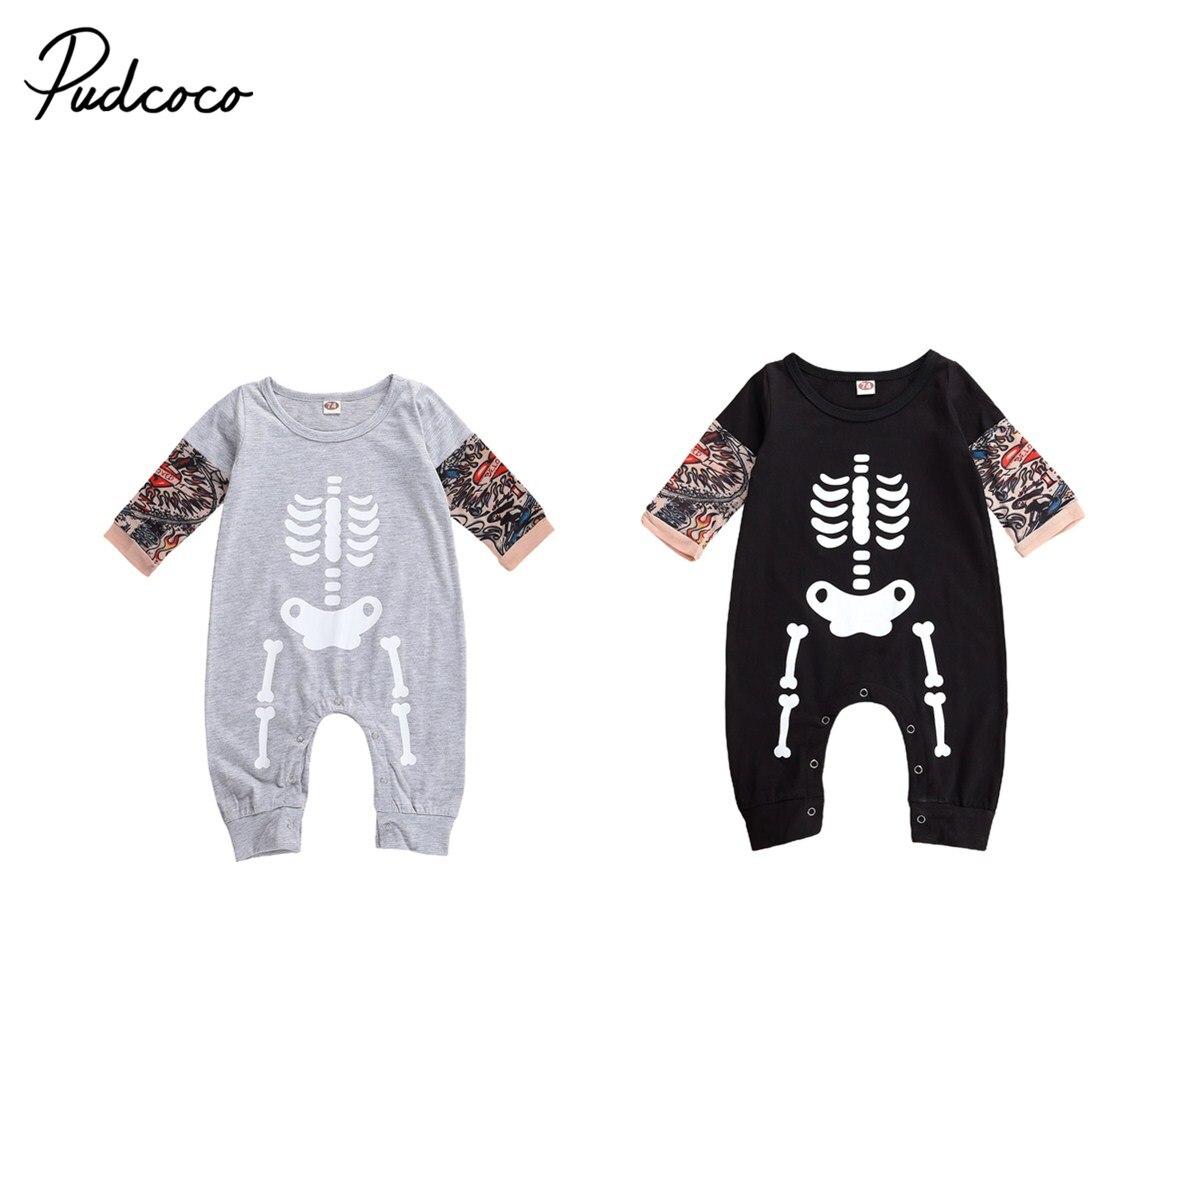 2020 nuevo Mono de bebé Halloween moda novedosa tatuaje esqueleto Halloween manga corta cuello redondo algodón Romper ropa de bebe